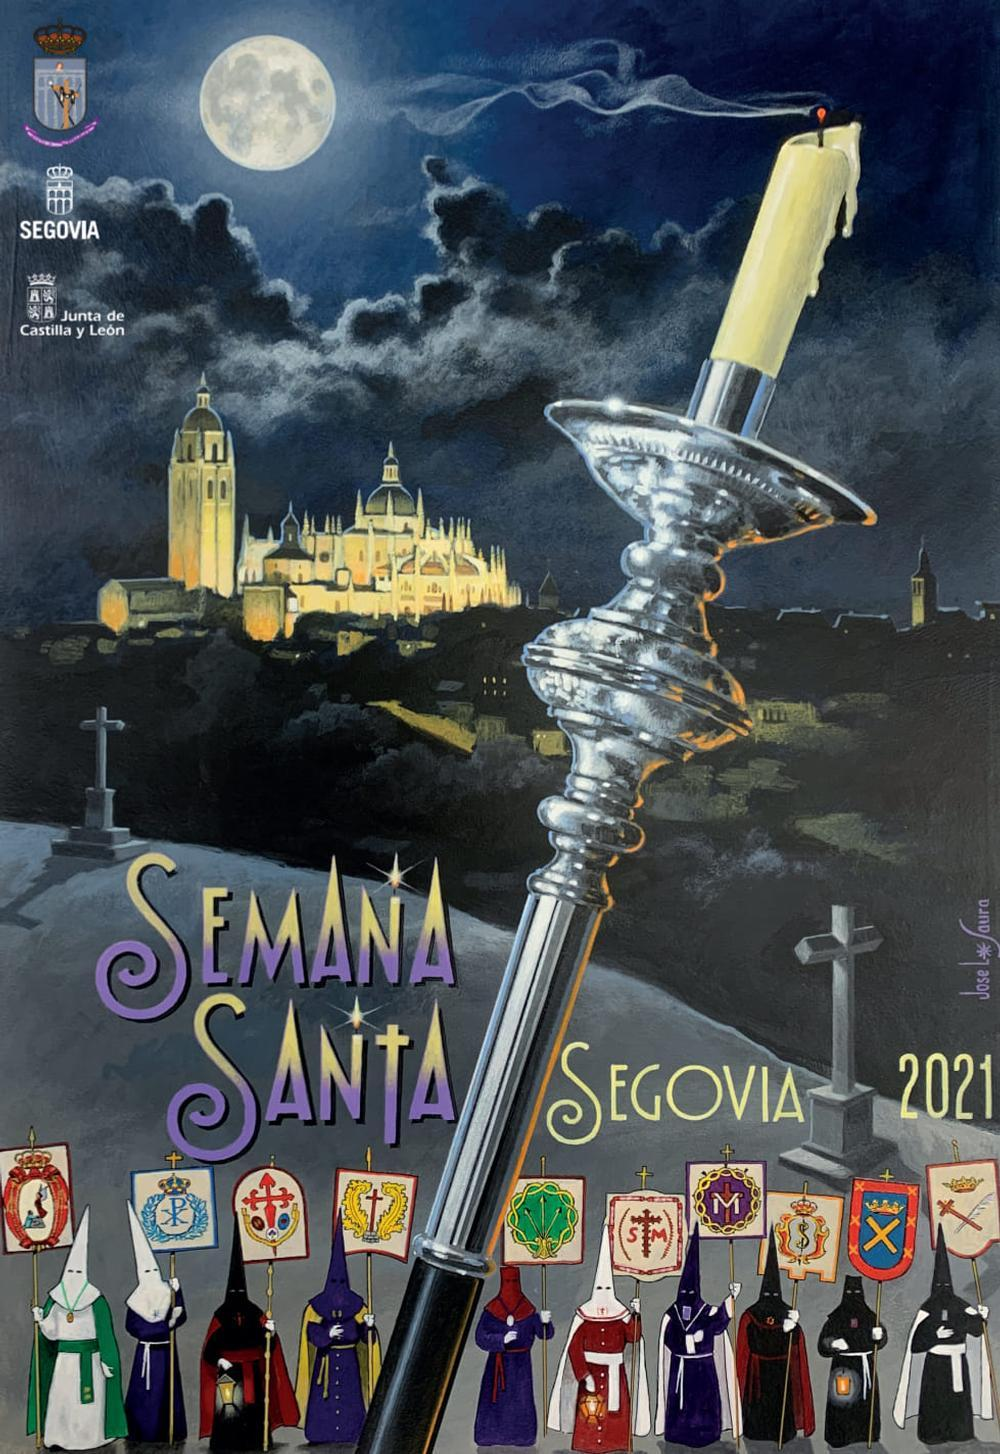 Holy Week Segovia